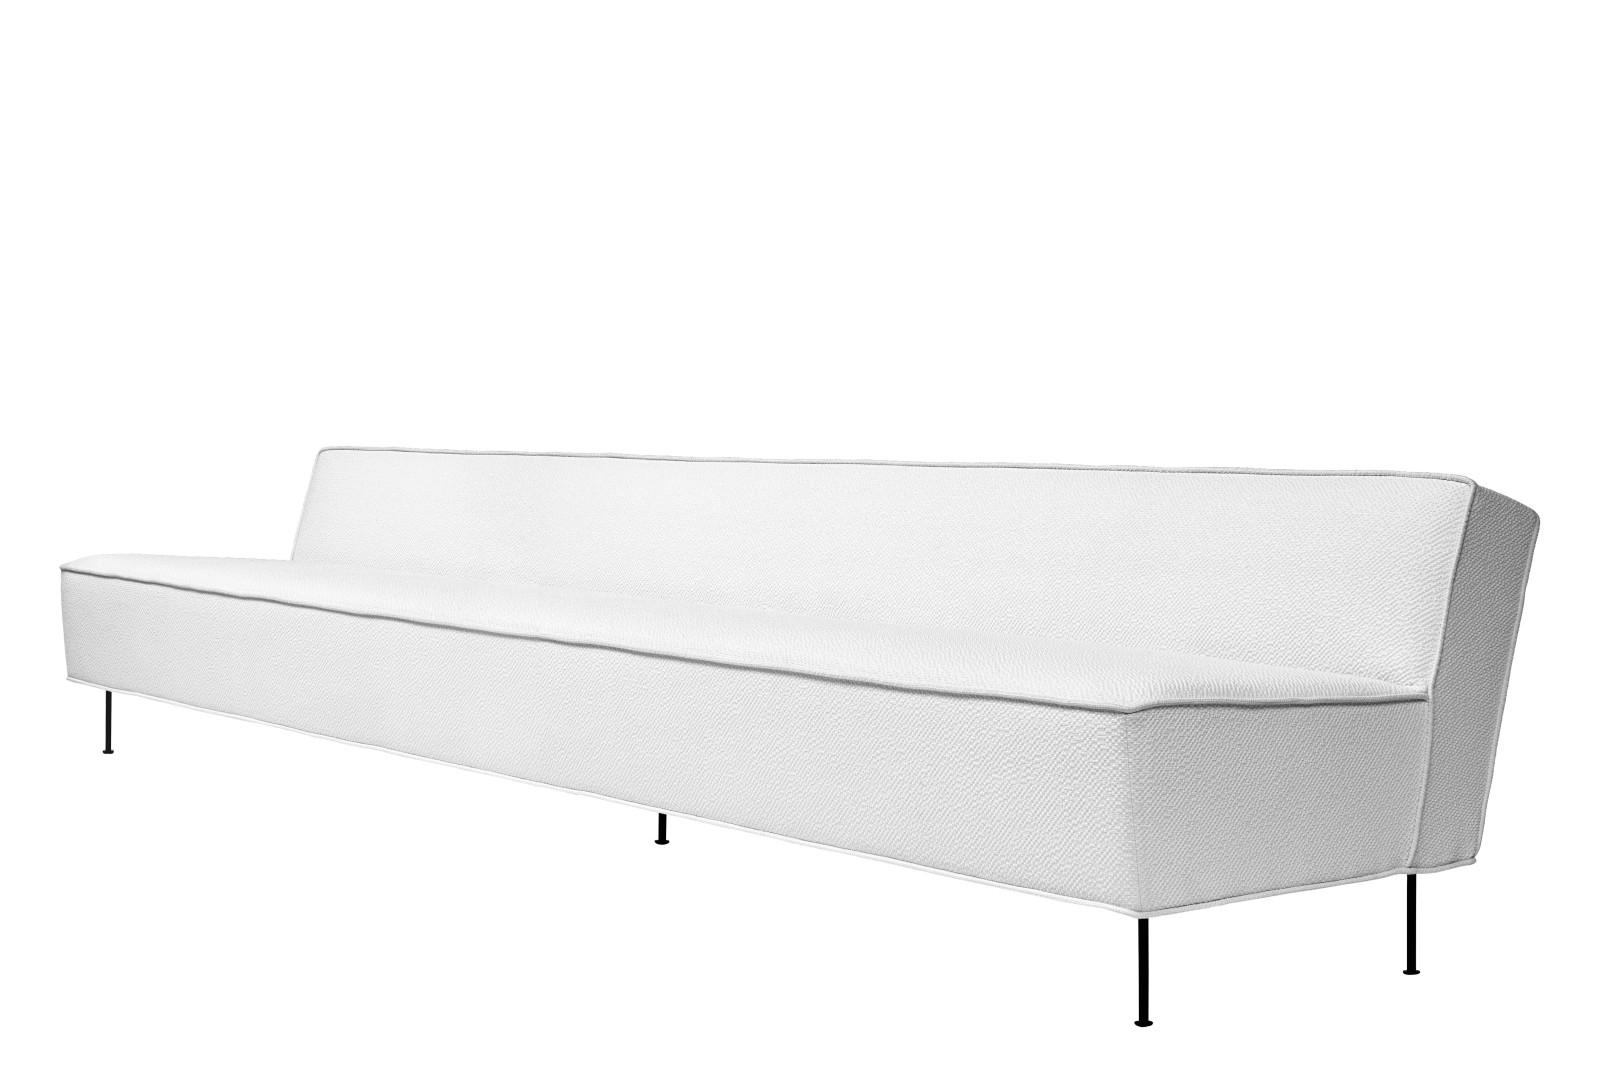 Modern Line Sofa 300, Gubi Metal Black, Price Grp. 04